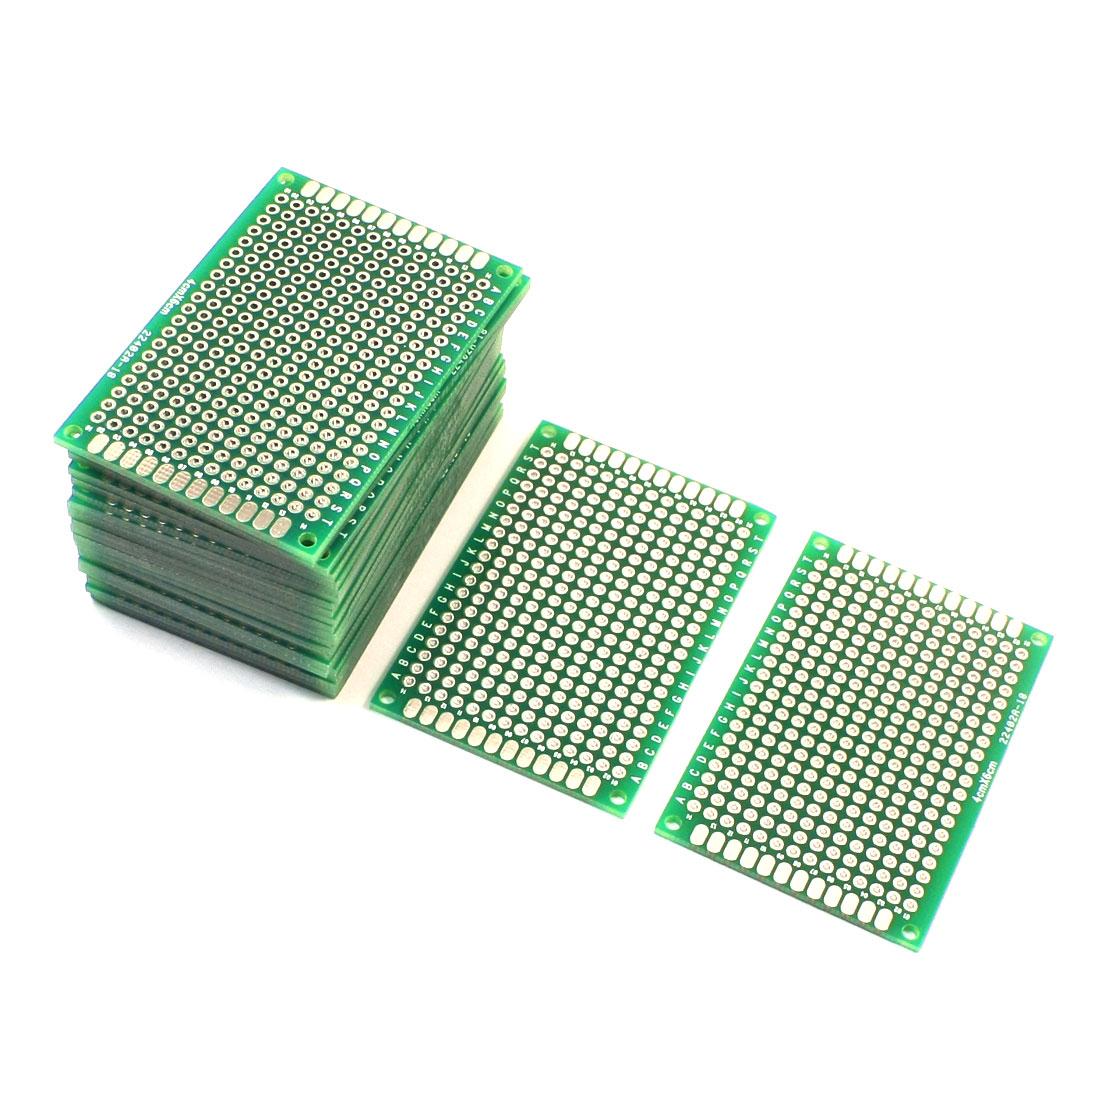 25Pcs Electronic DIY Double Sided Glass Fiber Prototyping PCB Board 4cm x 6cm